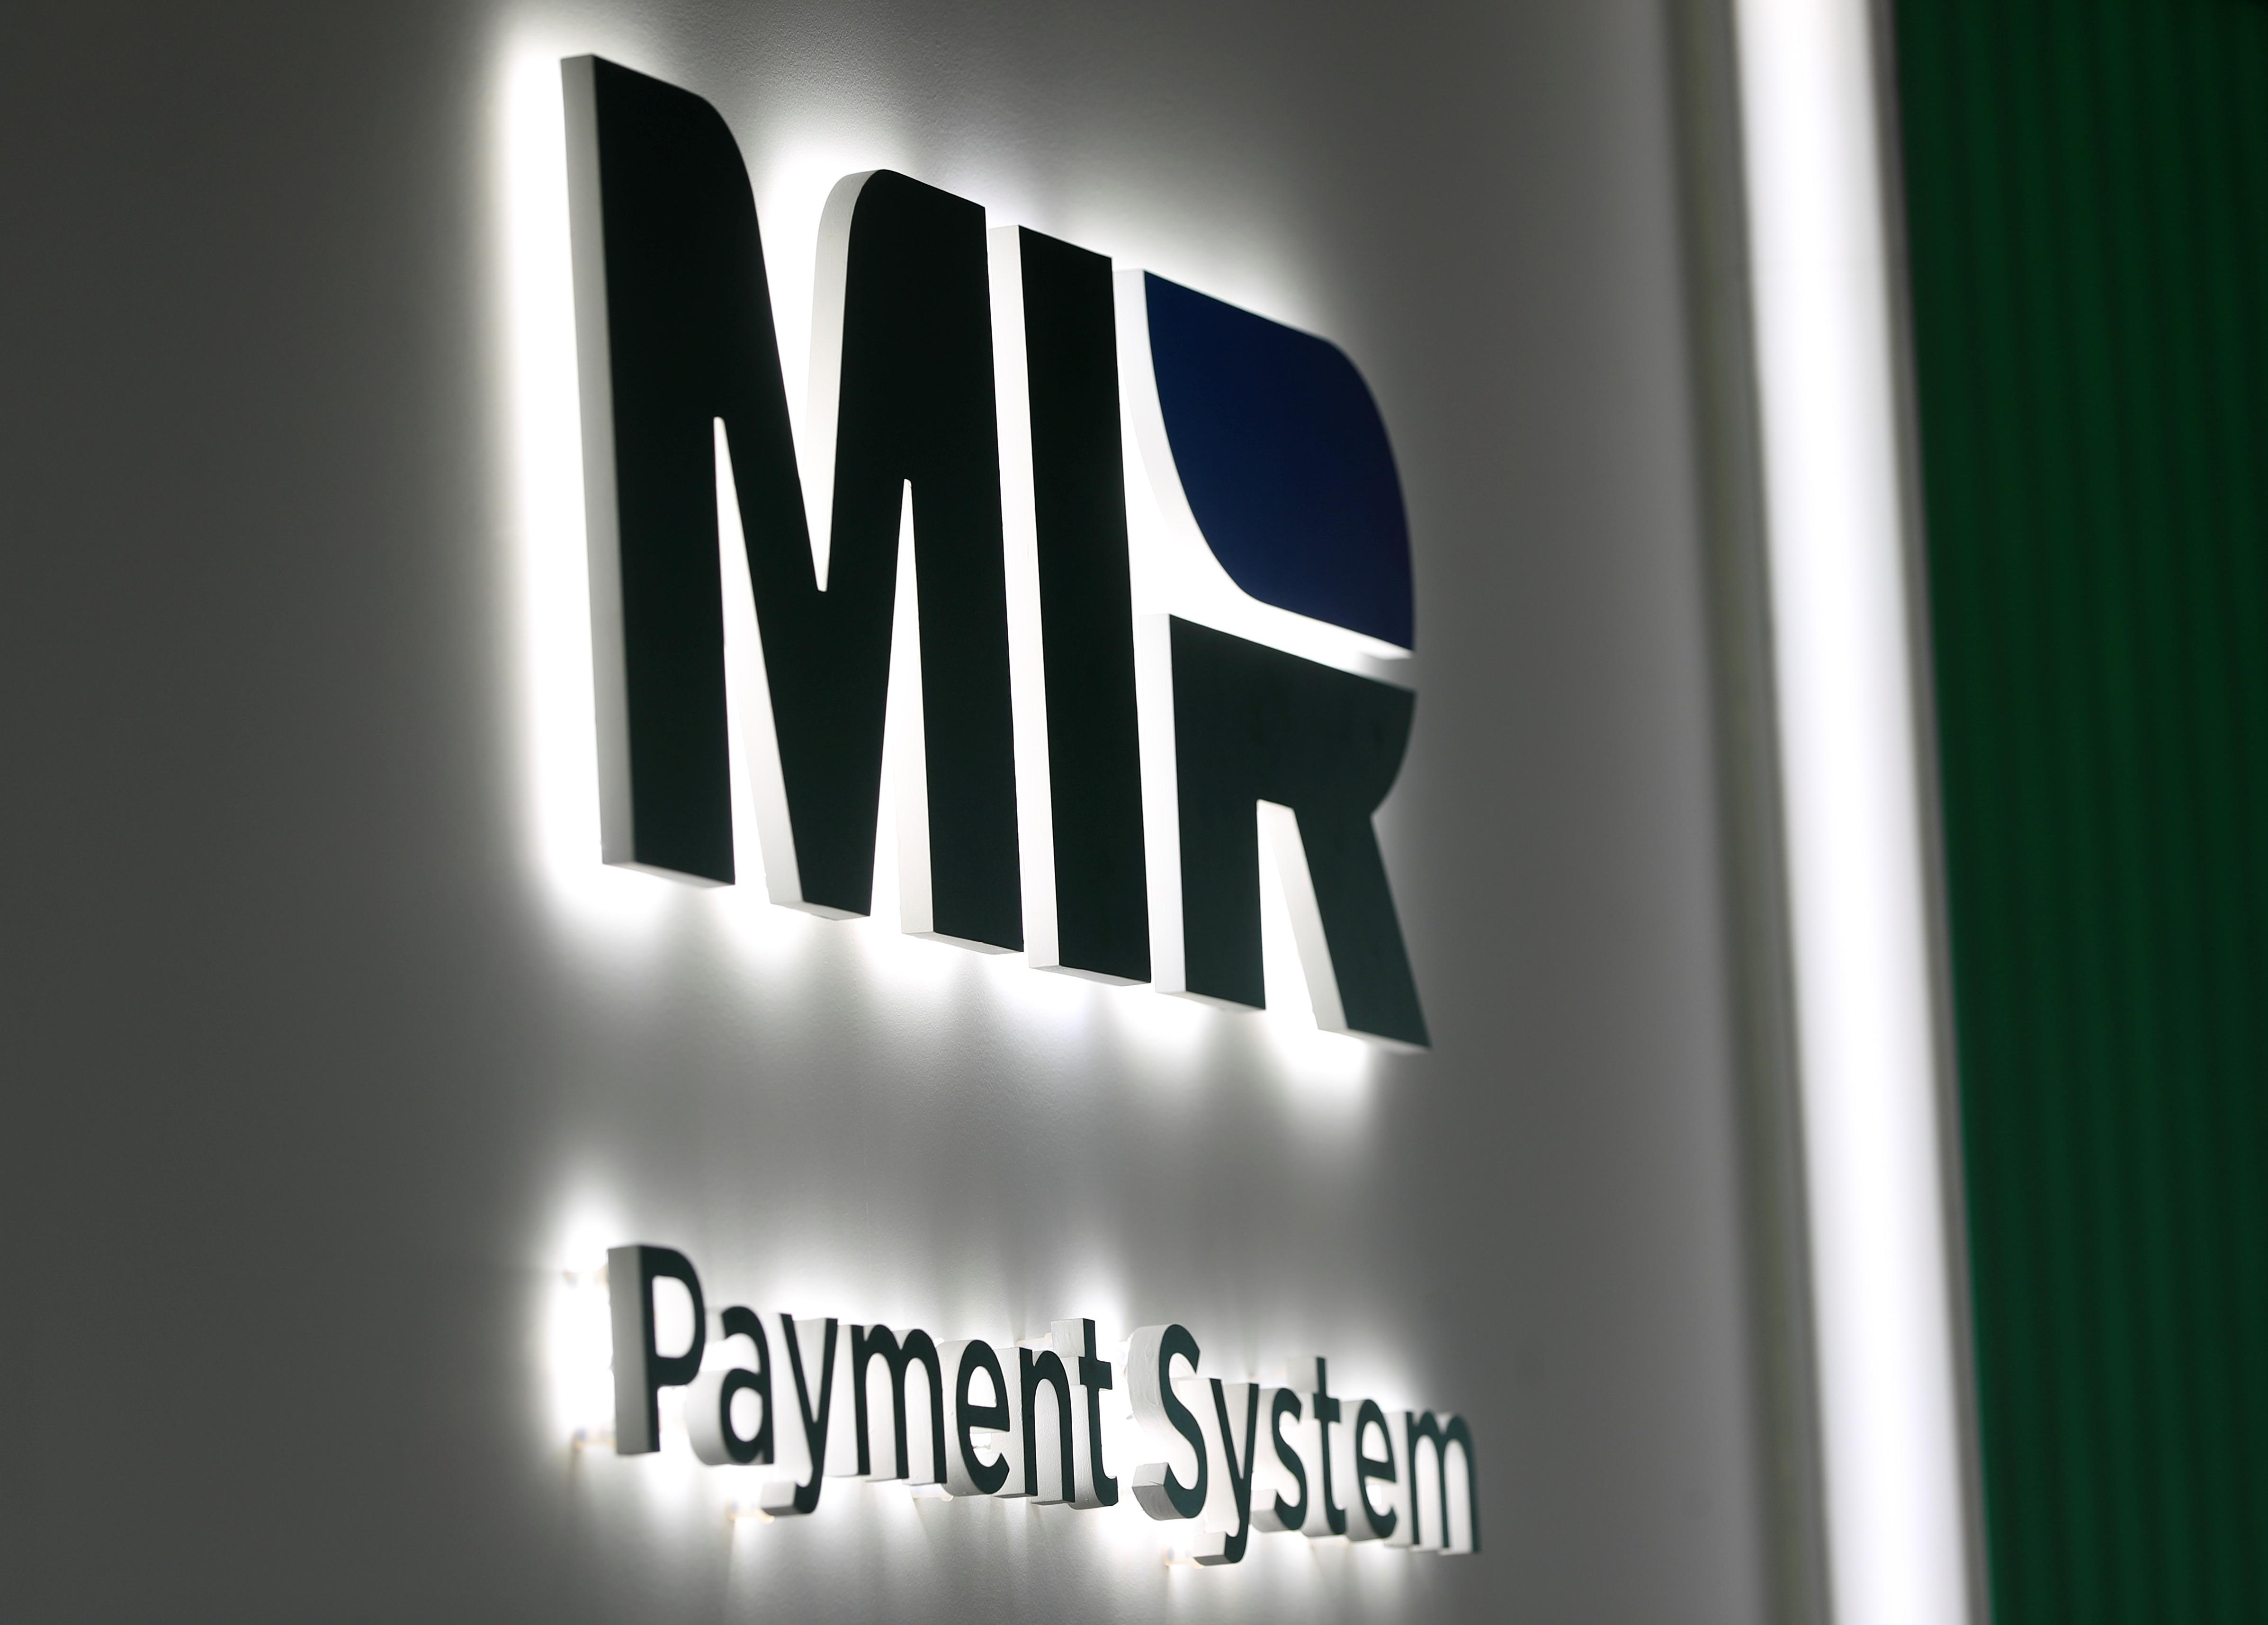 The logo of MIR payment system is on display at the St. Petersburg International Economic Forum (SPIEF) in Saint Petersburg, Russia, June 2, 2021. REUTERS/Evgenia Novozhenina/Files